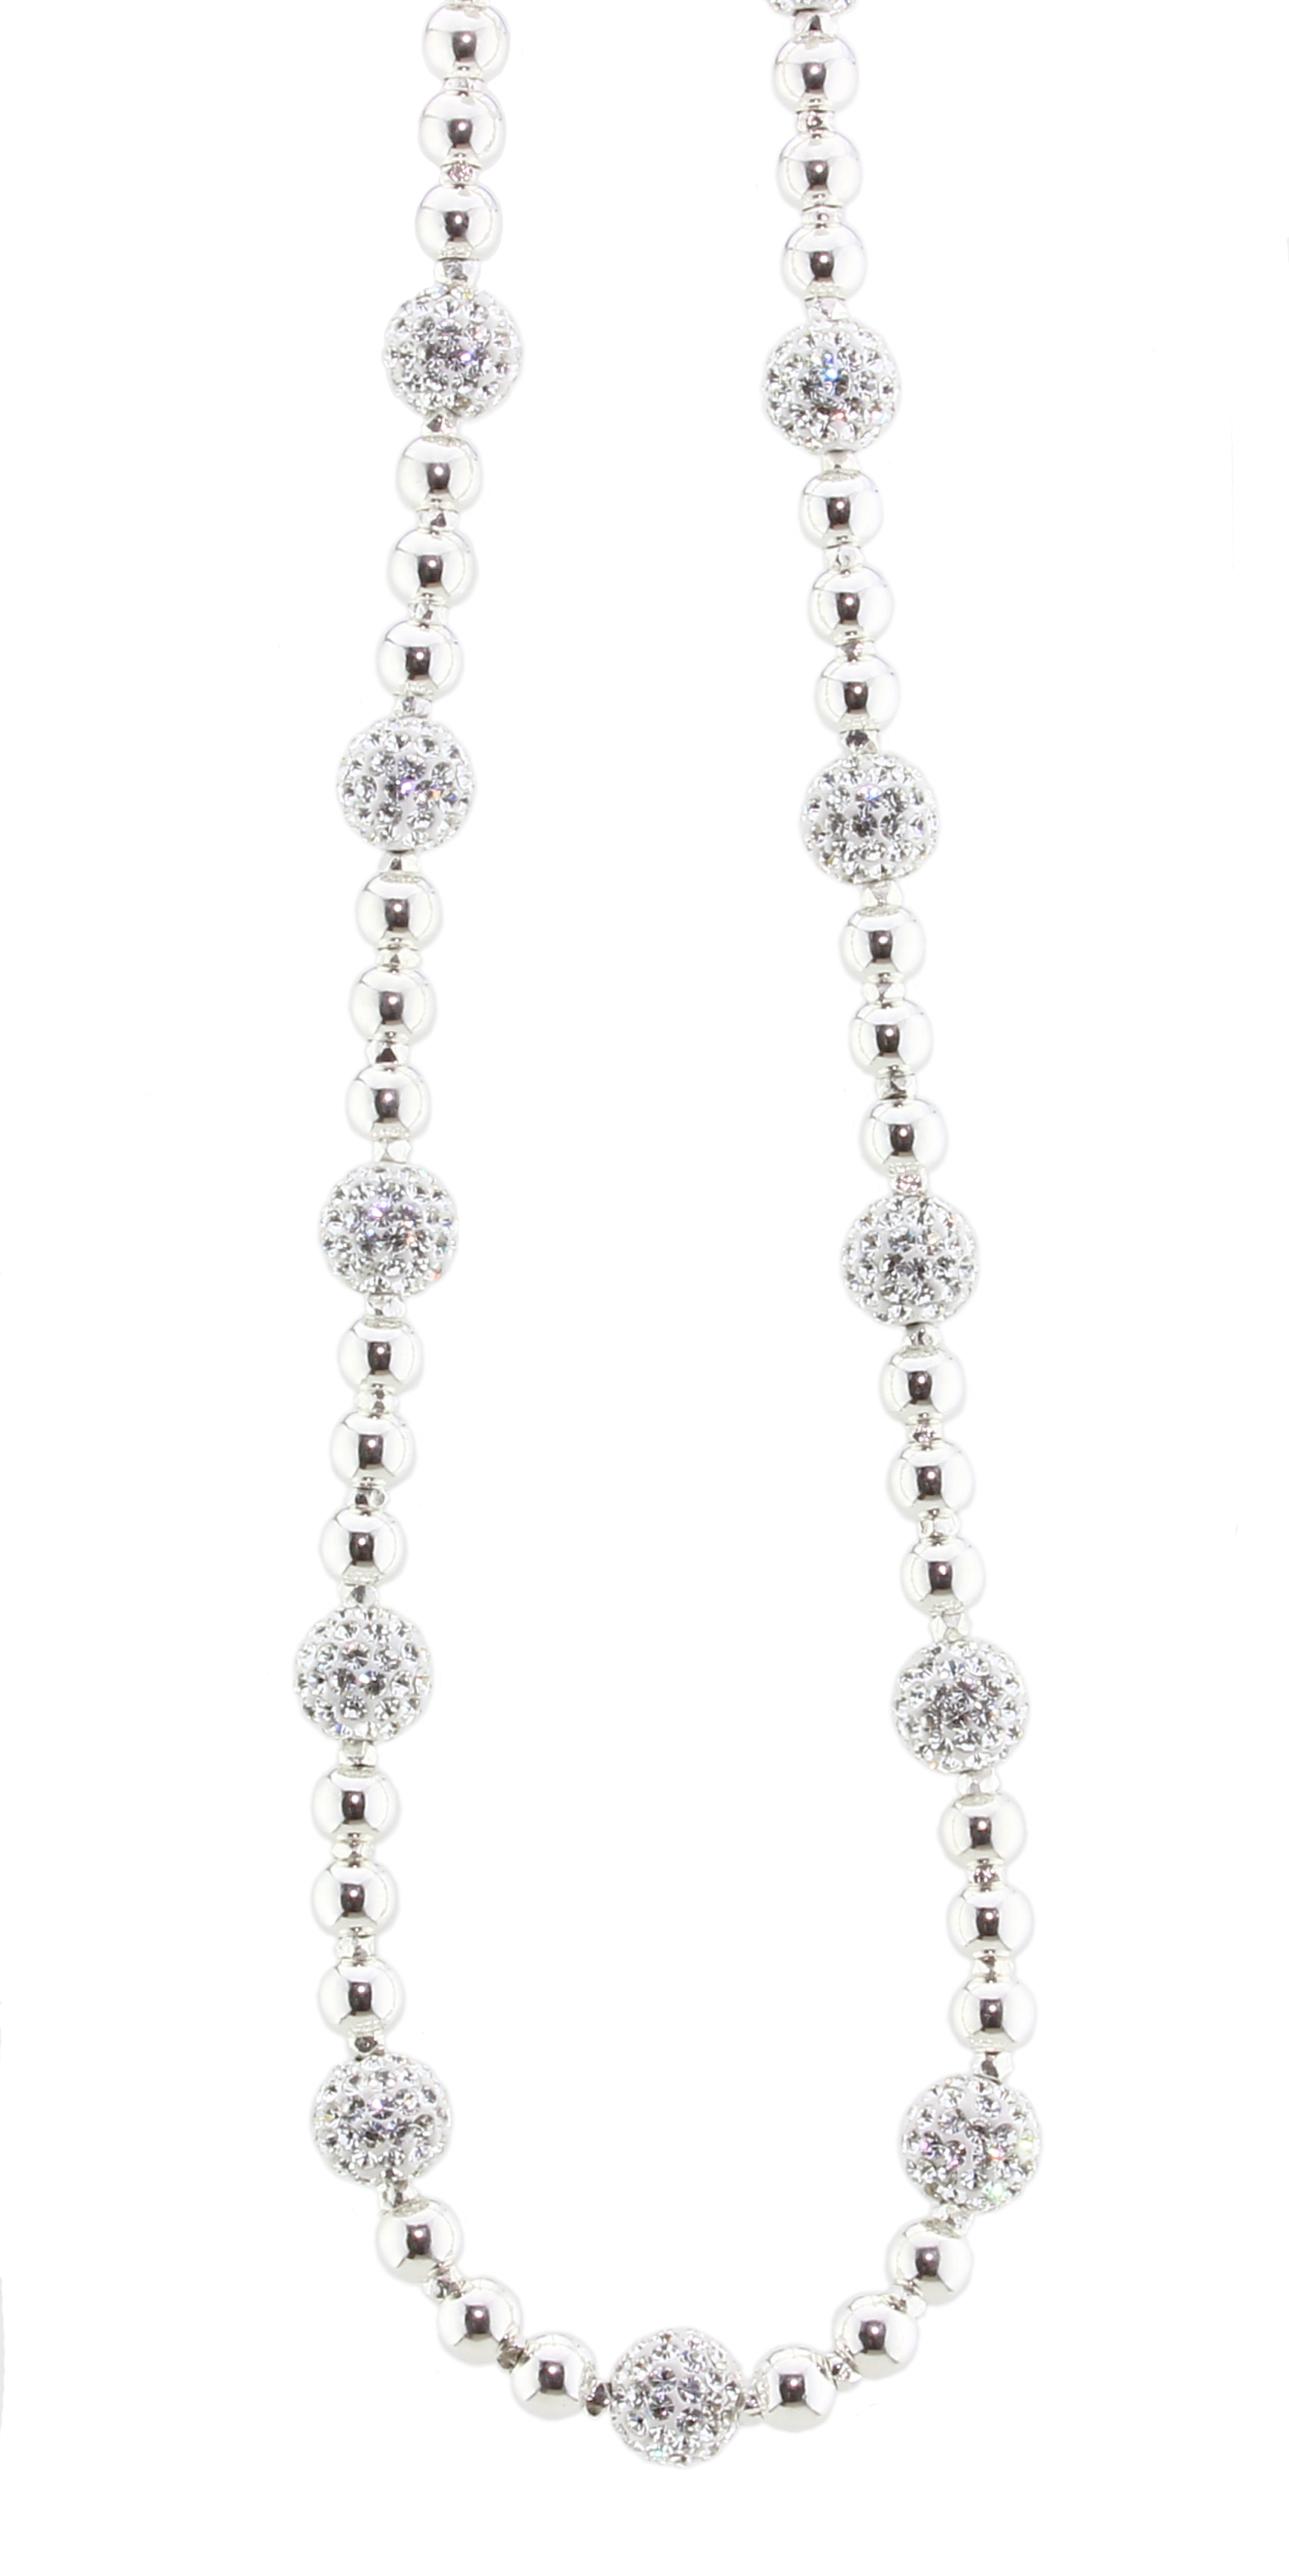 1388 Lady Like Necklace